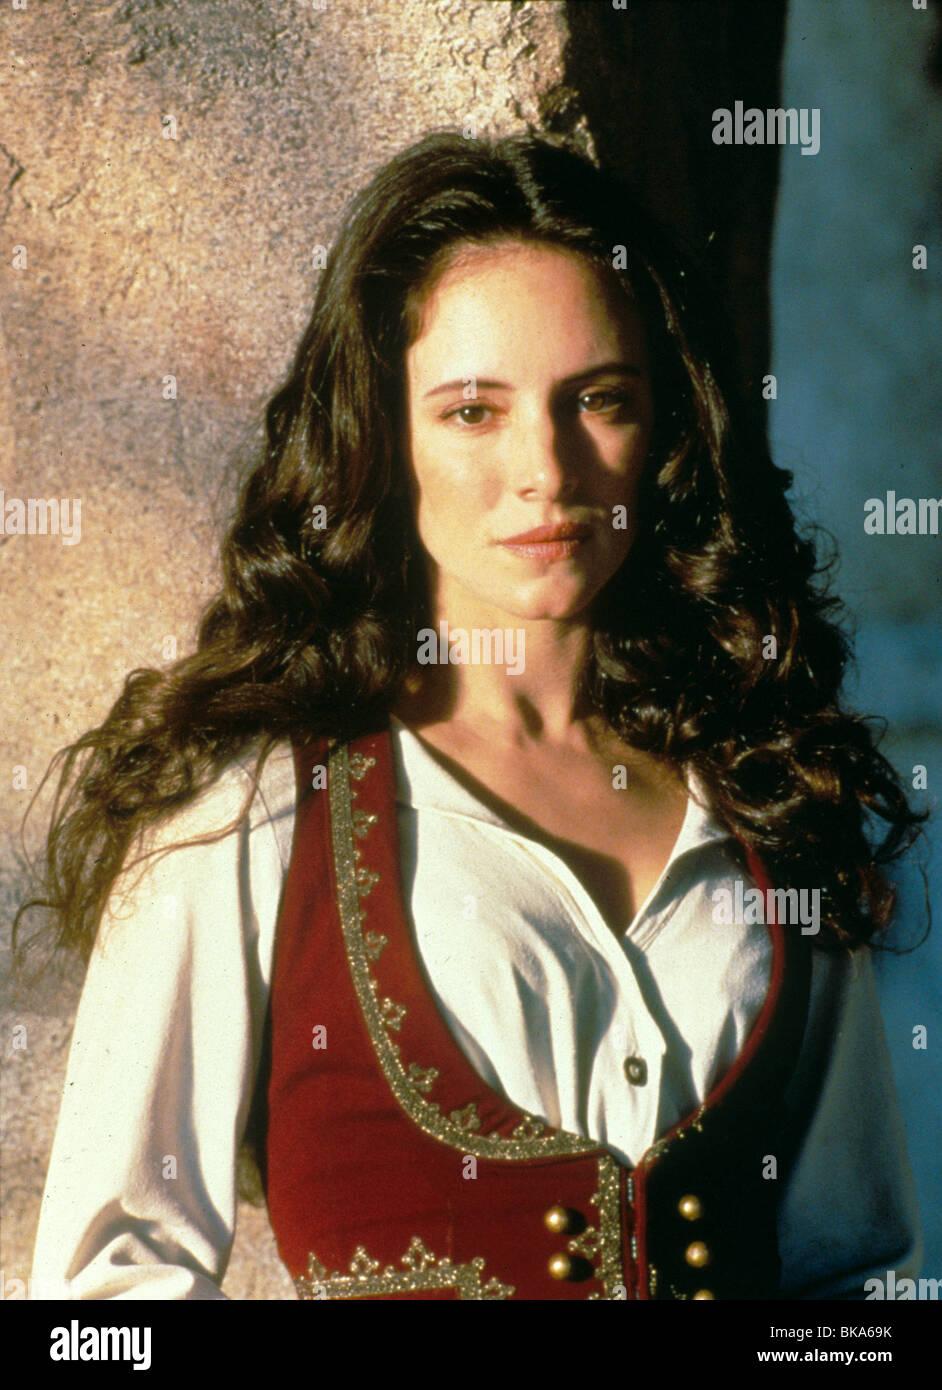 Movita Castaneda,Mary Crosby XXX video Fergie (singer),Meg Imperial (b. 1993)